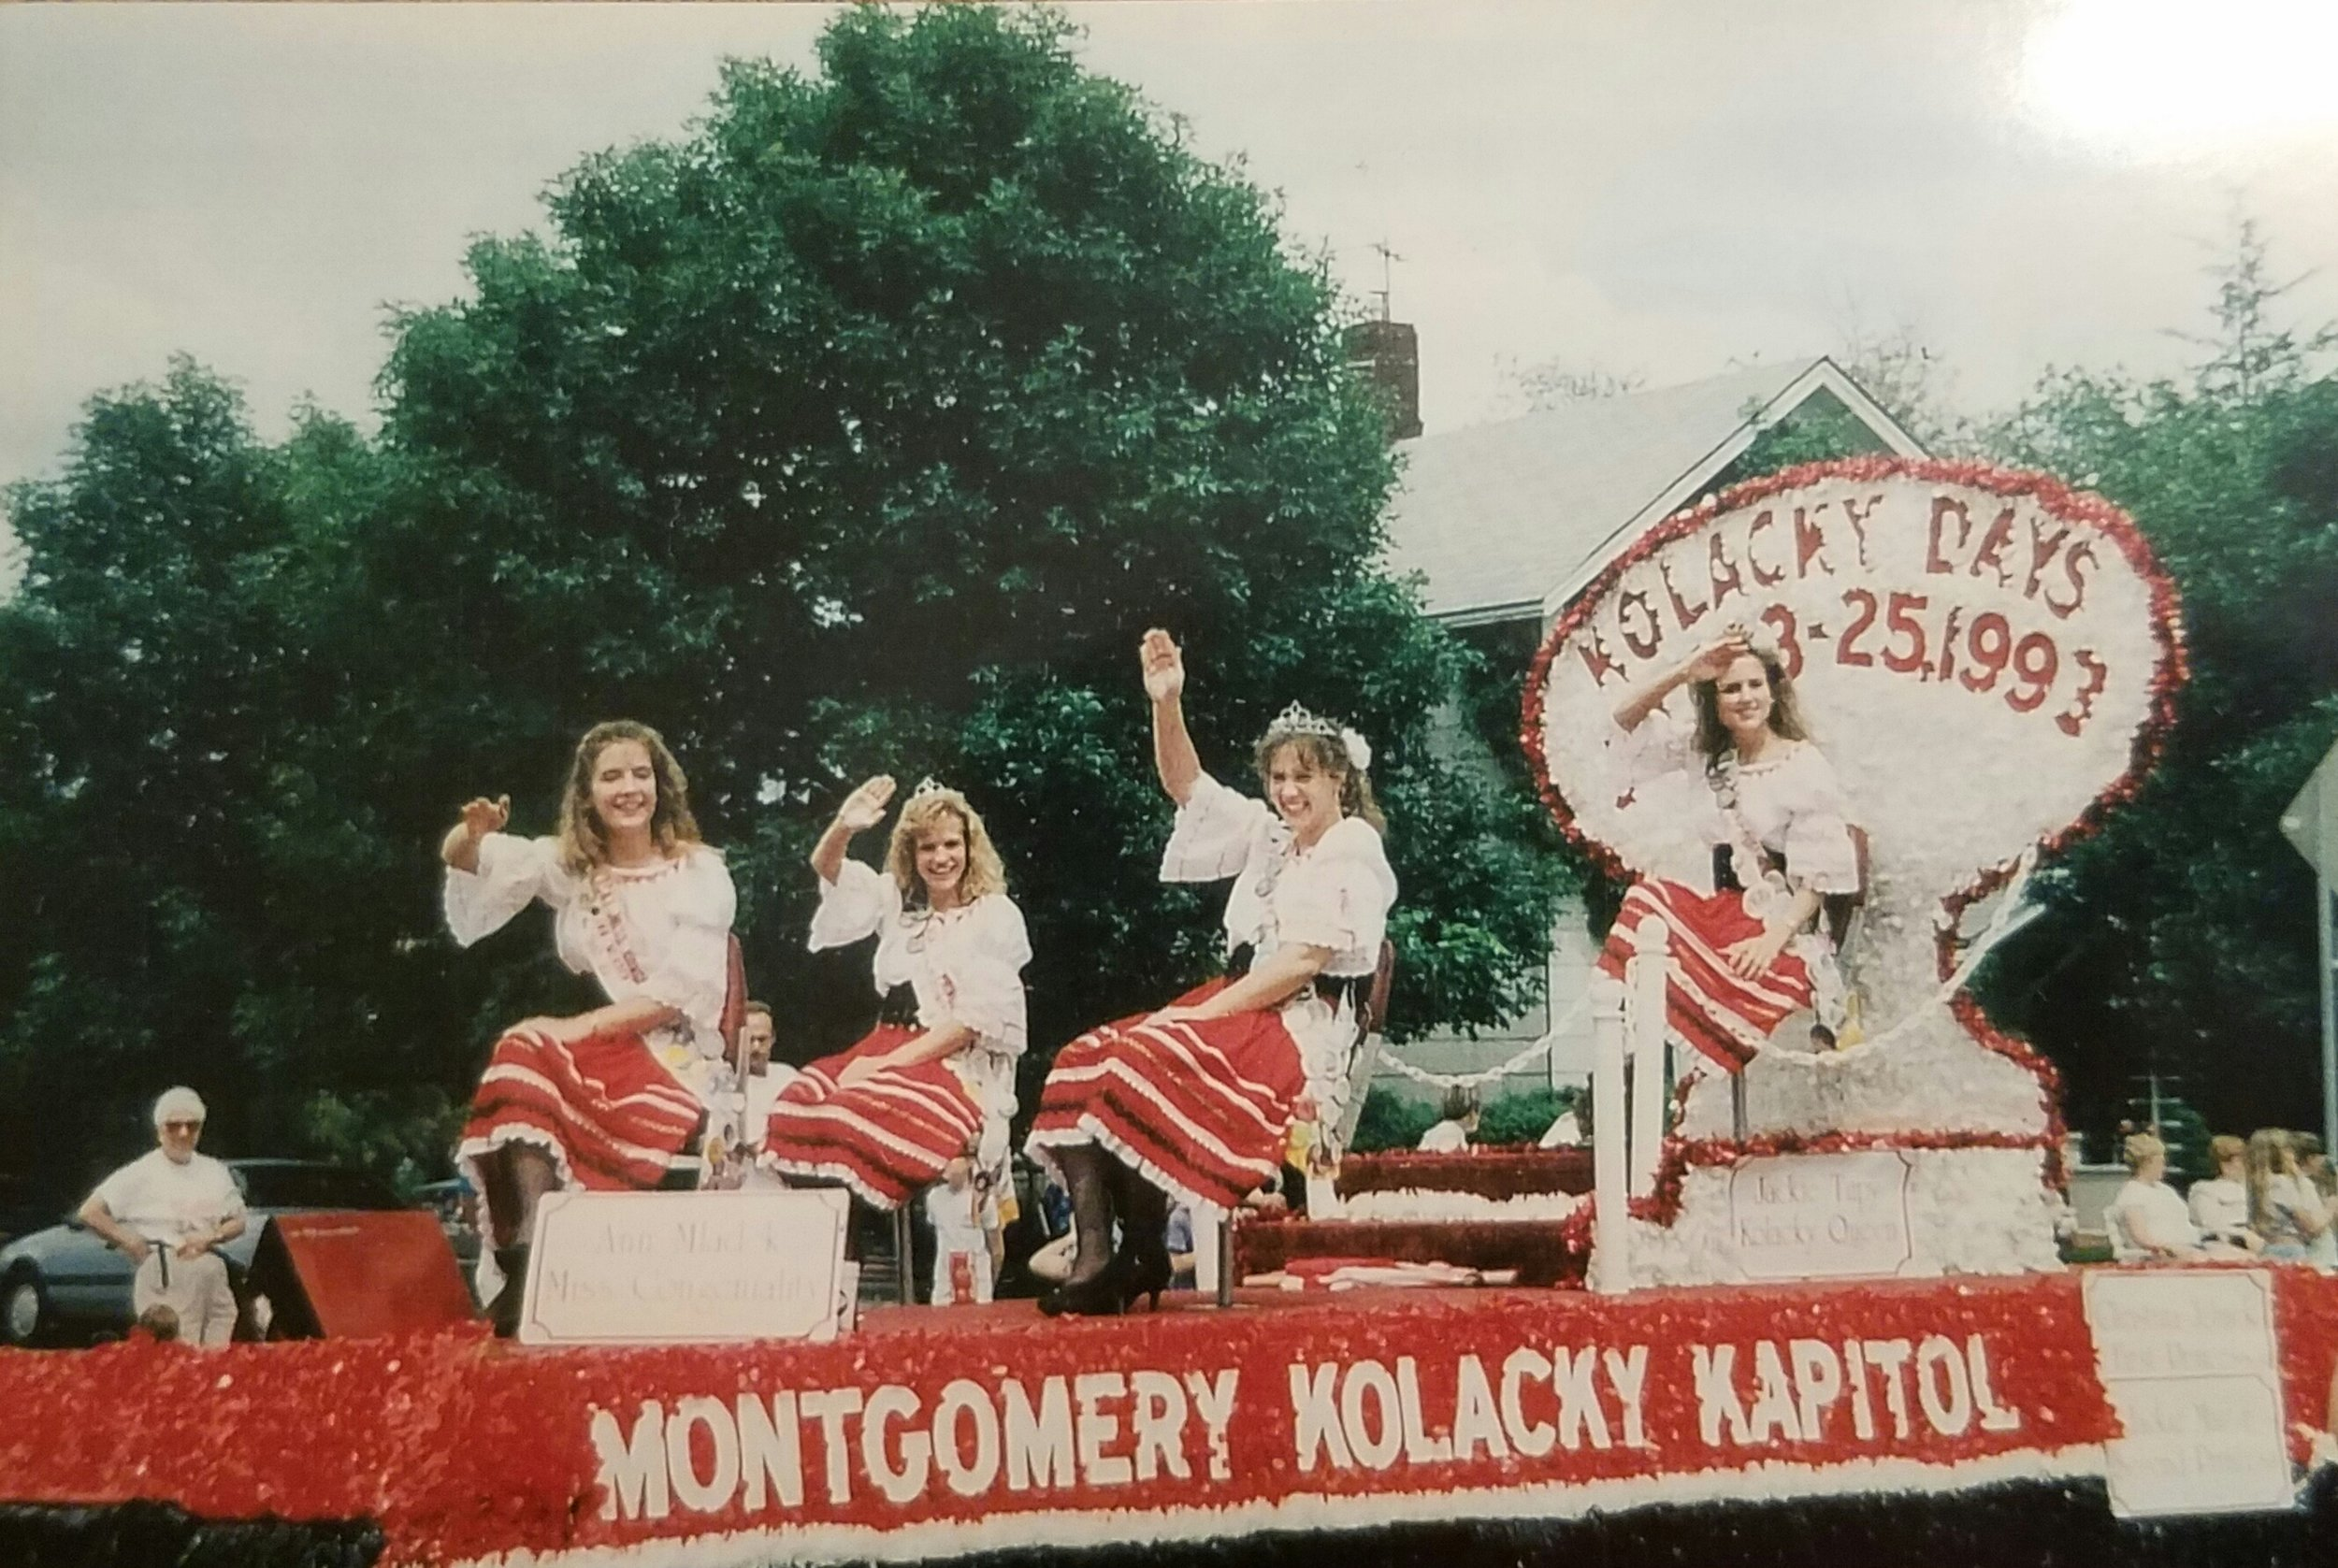 Montgomery's 1992 Kolacky Days Royalty From Left: Miss Congeniality Ann Mladek, 1st Princess Christina Jelinek, 2nd Princess Jackie Martin and Queen Jacqueline Tupy.